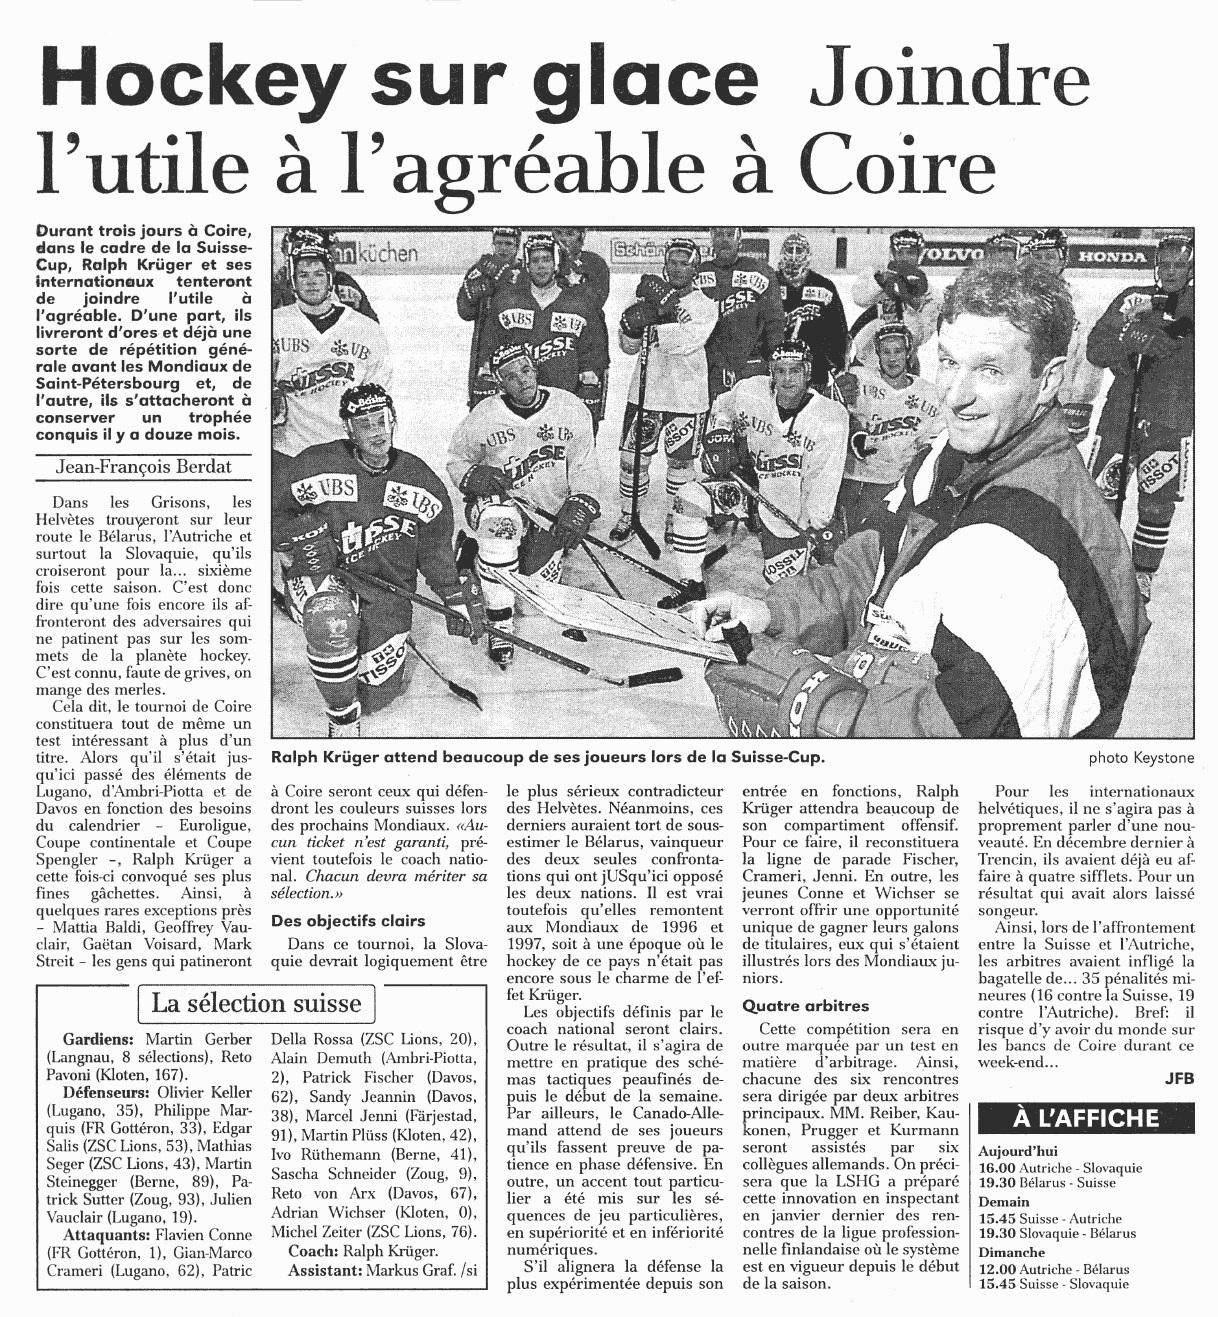 EDITION  FEB 11, 2000.jpg